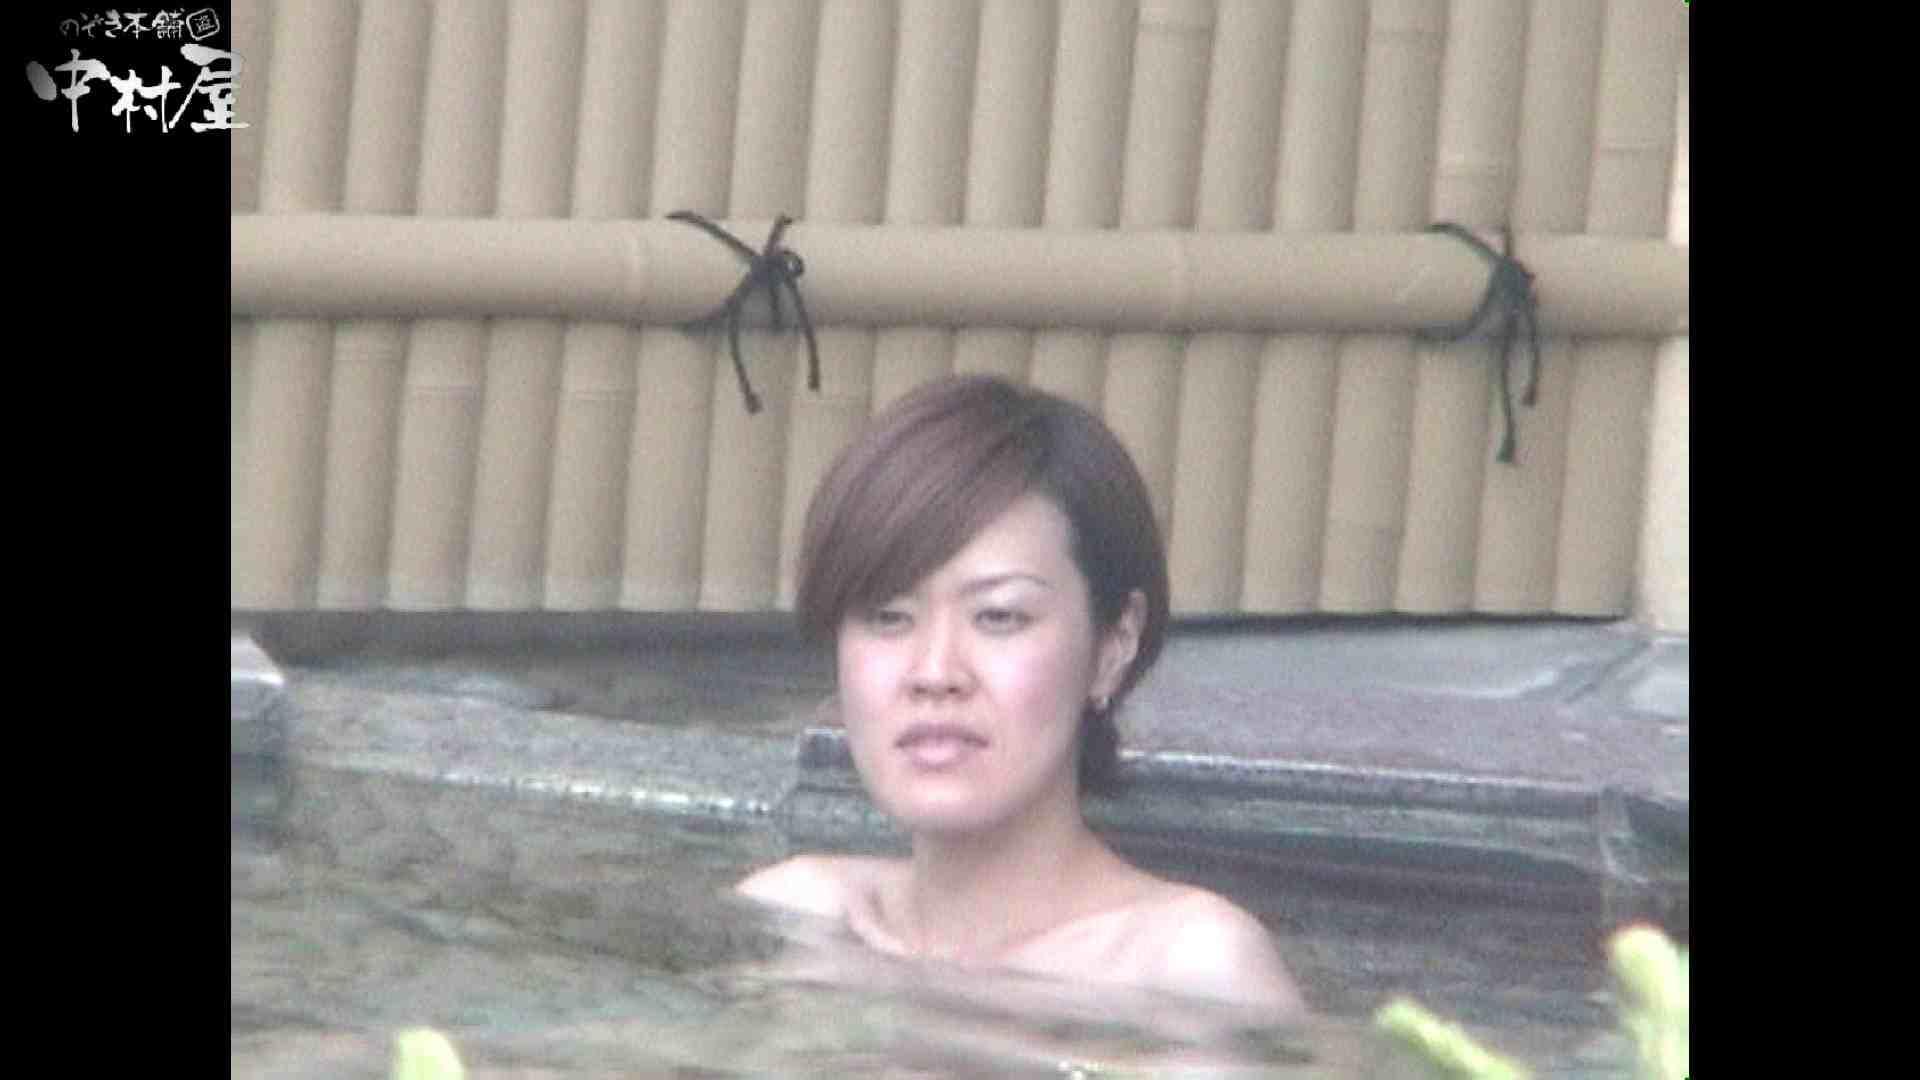 Aquaな露天風呂Vol.961 露天風呂 | OLのエロ生活  104連発 70